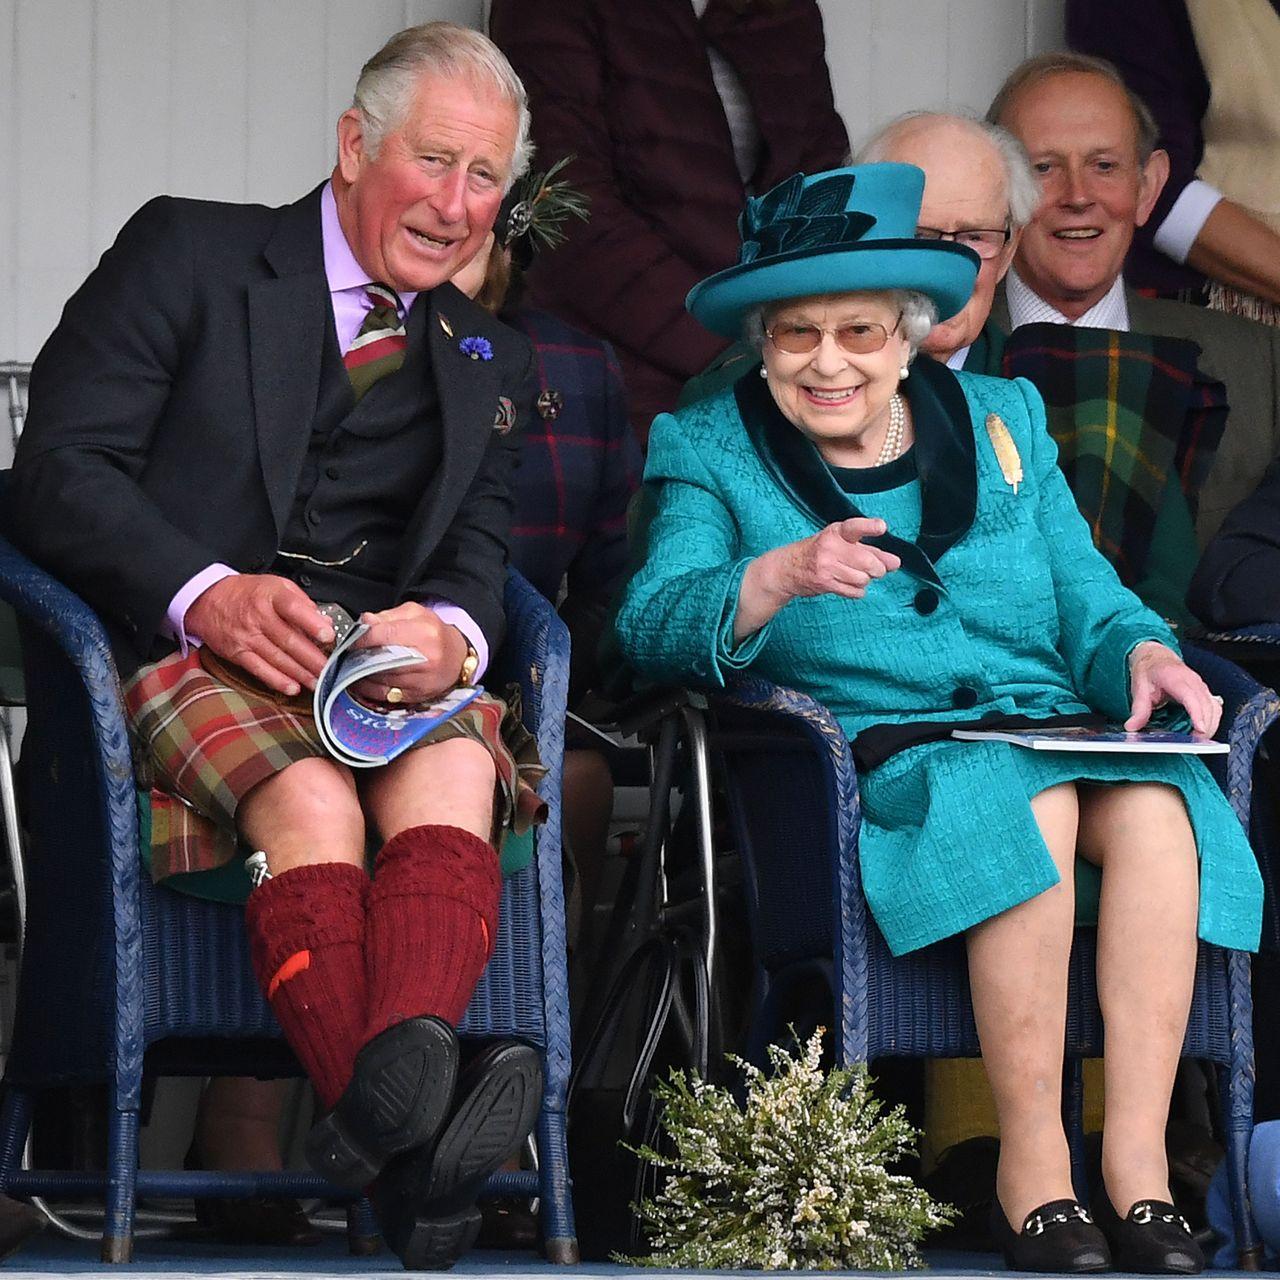 The Braemar Royal Highland Gathering 2018